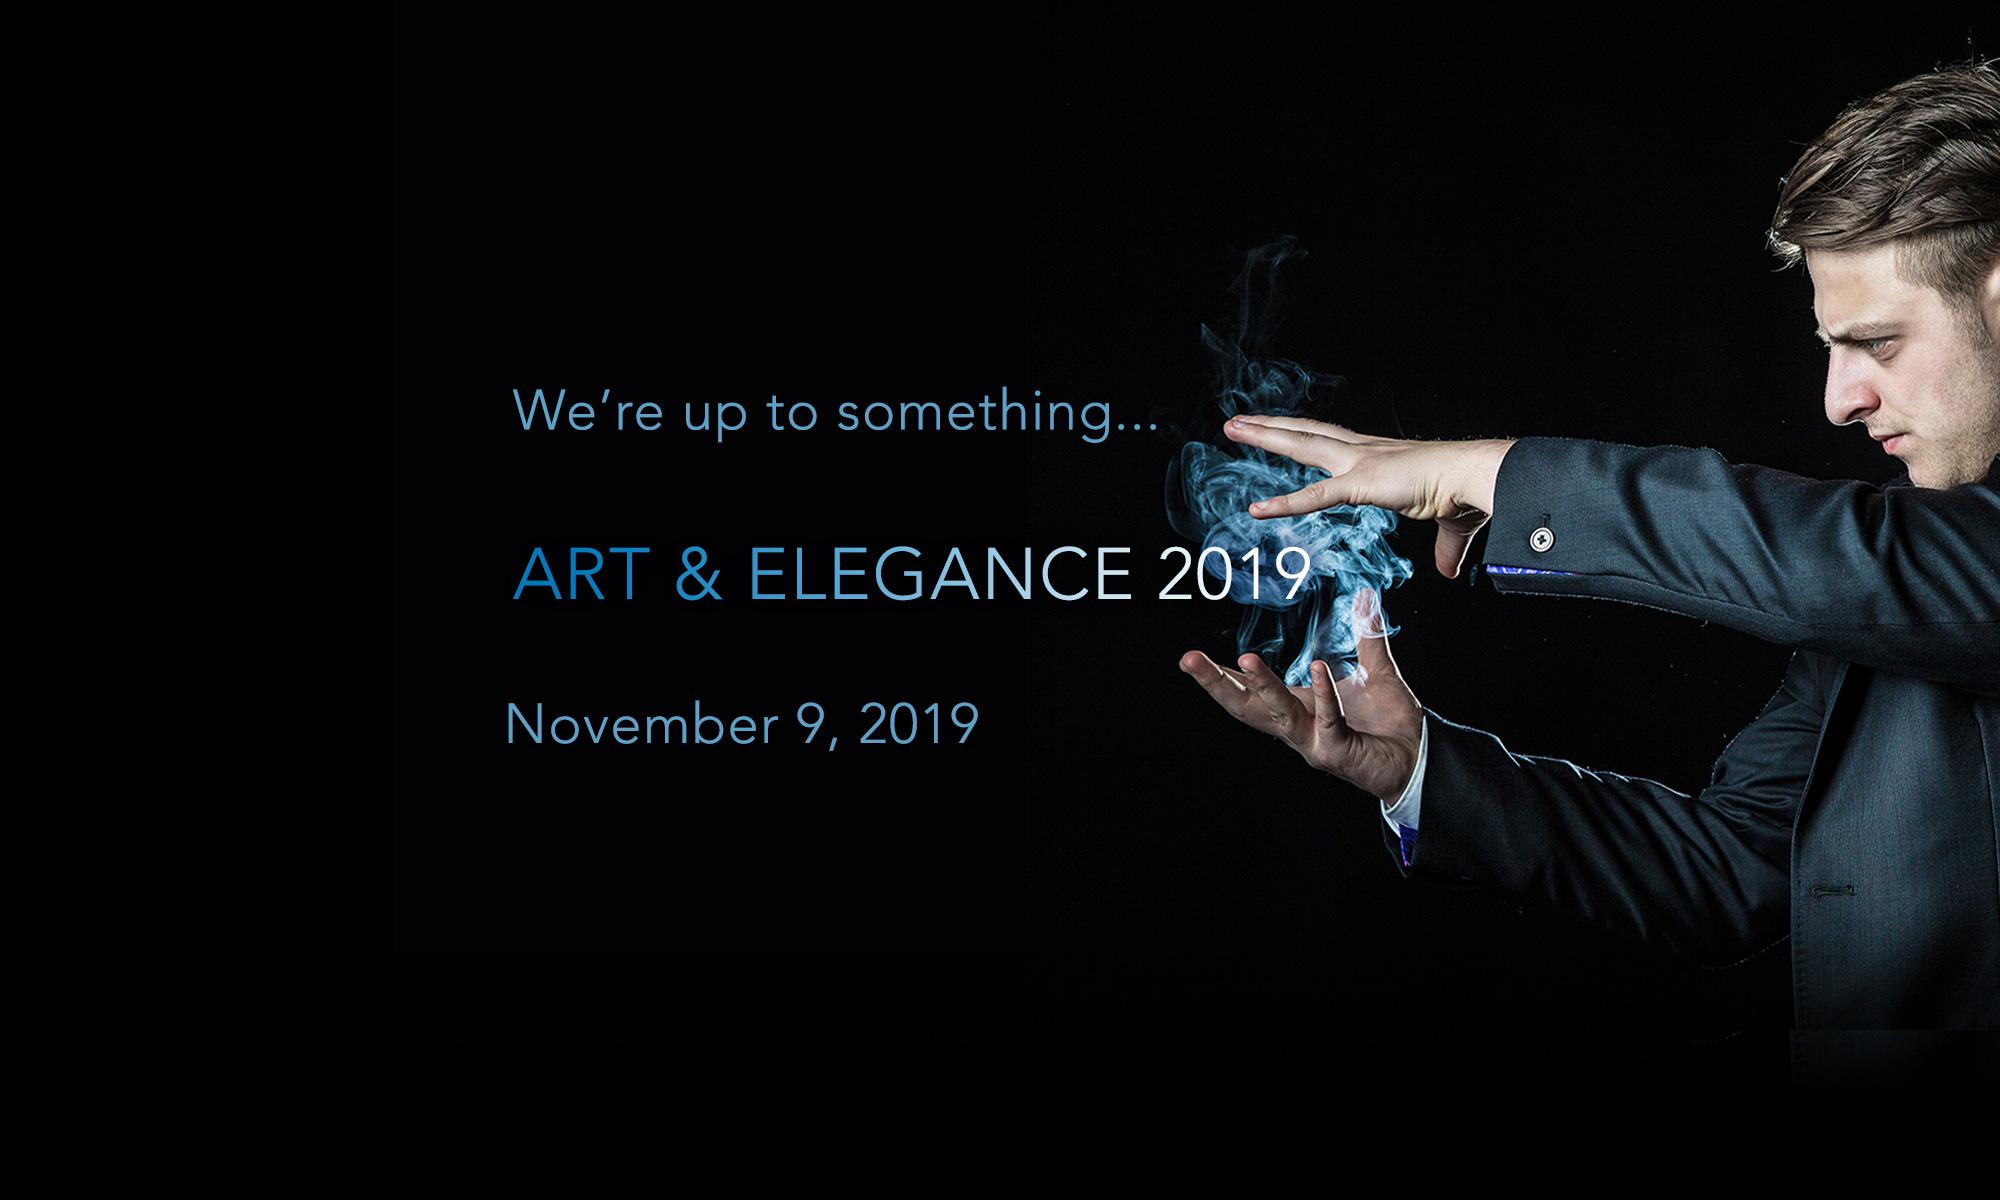 Art & Elegance 2019